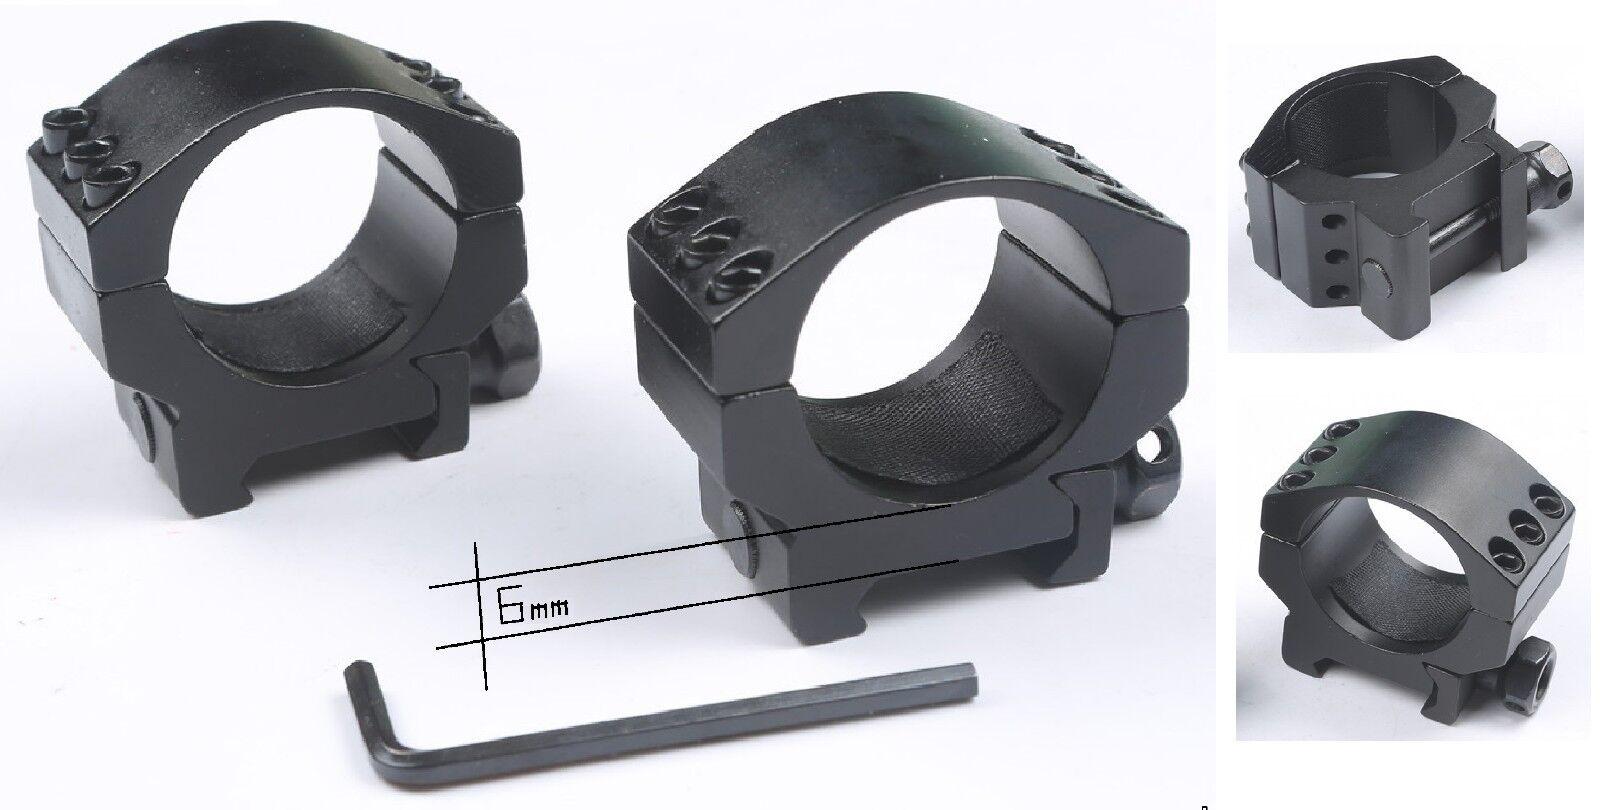 Anillas MuyBajas Picatinny para Visores 30 mm de de de diámetro  Caza Rifles  400c00